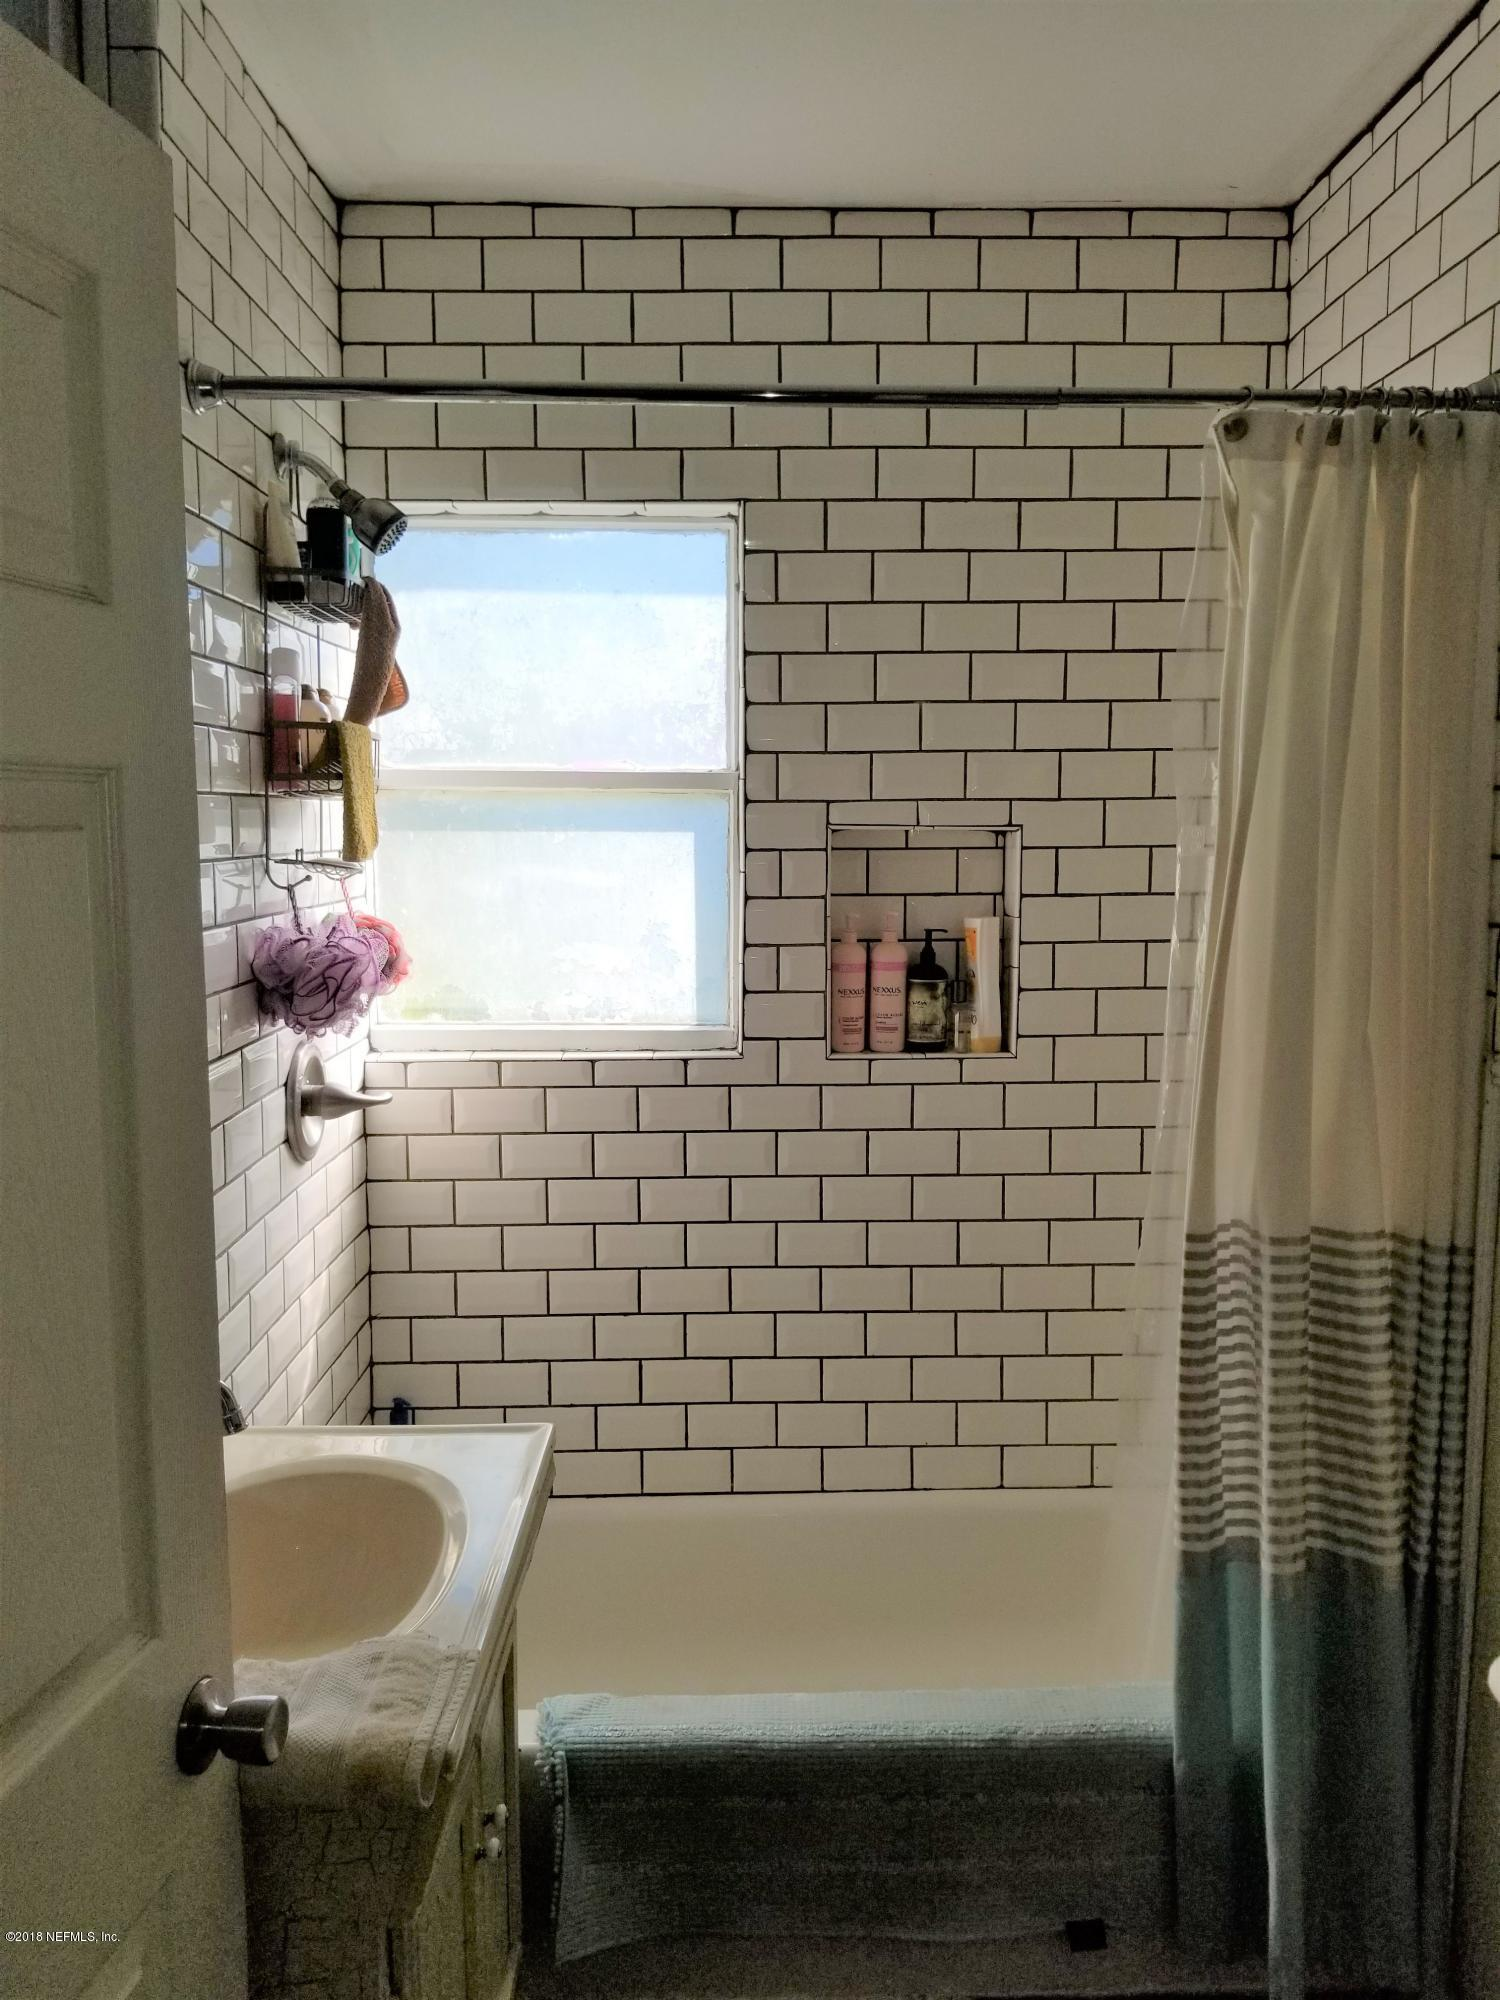 2504 LARSEN, JACKSONVILLE, FLORIDA 32207, 2 Bedrooms Bedrooms, ,1 BathroomBathrooms,Residential - single family,For sale,LARSEN,964796